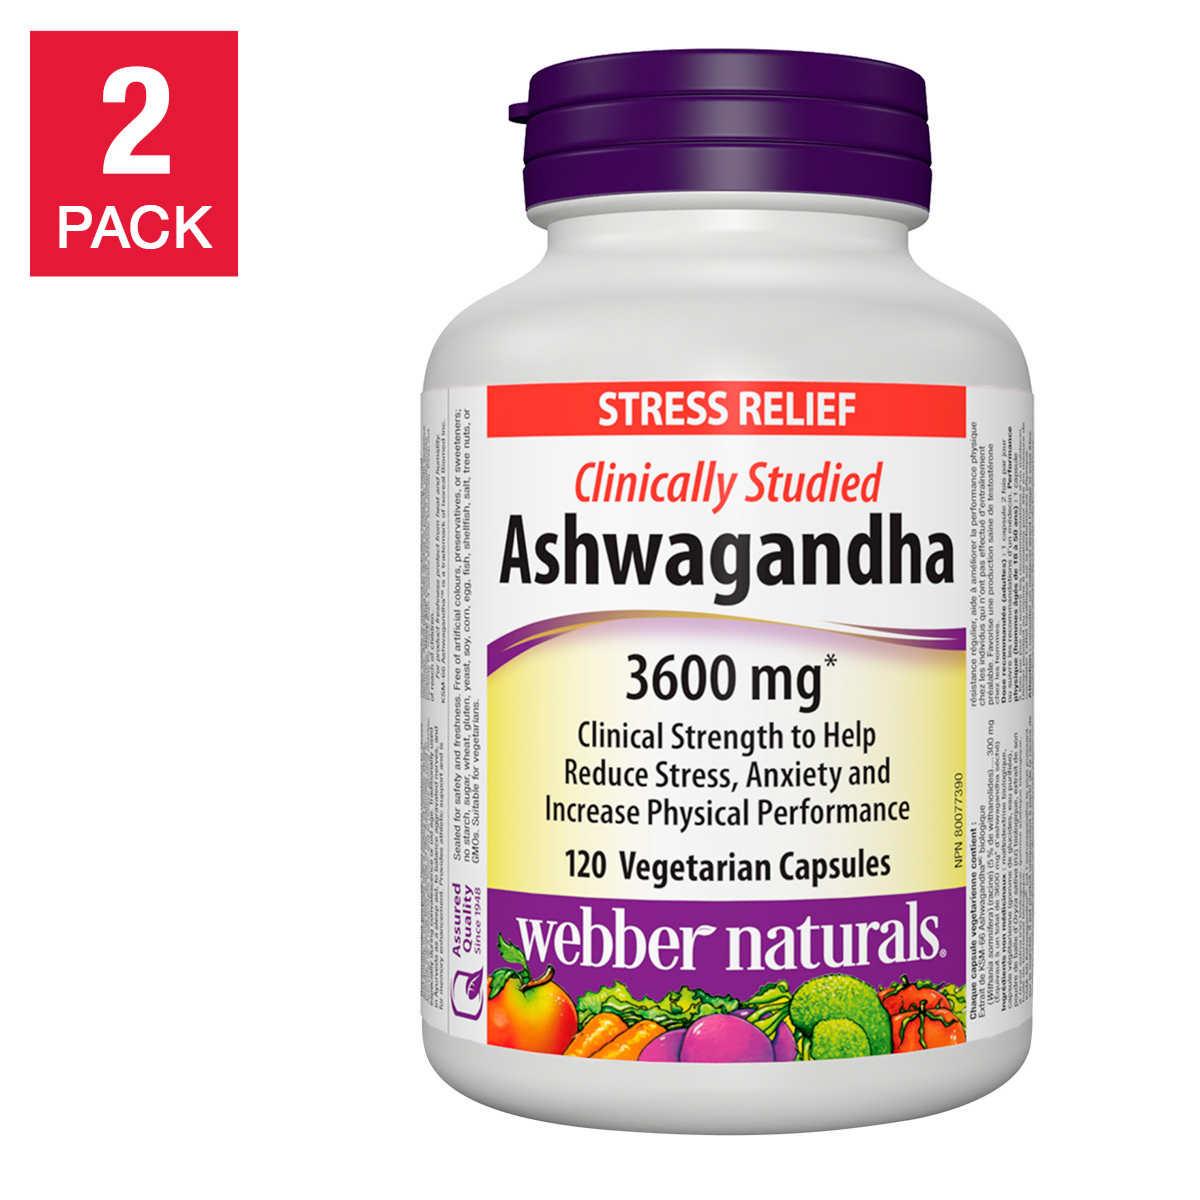 webber naturals Ashwagandha Vegetarian Capsules, 120-count, 2 ...